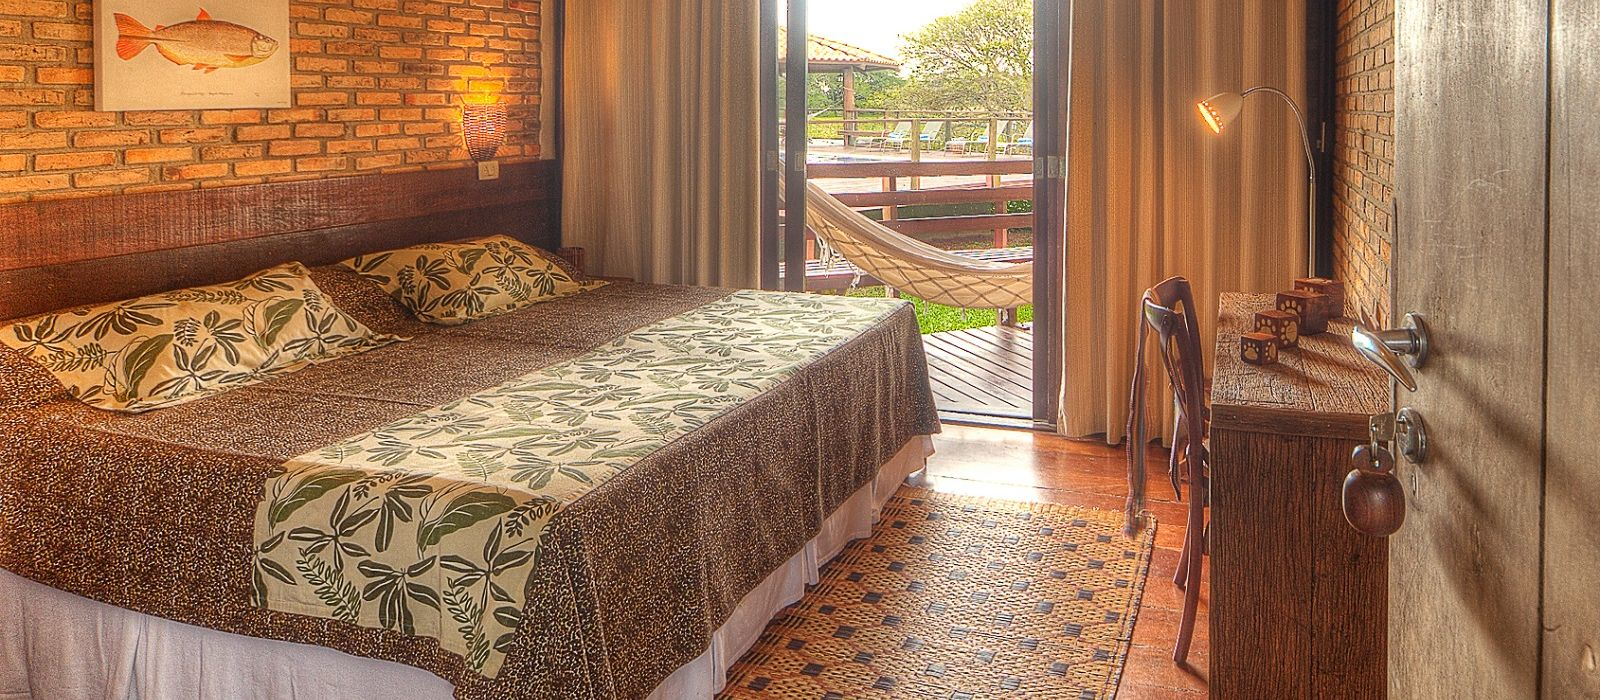 Hotel Caiman Ecological Refuge Baiazinha Lodge Brazil